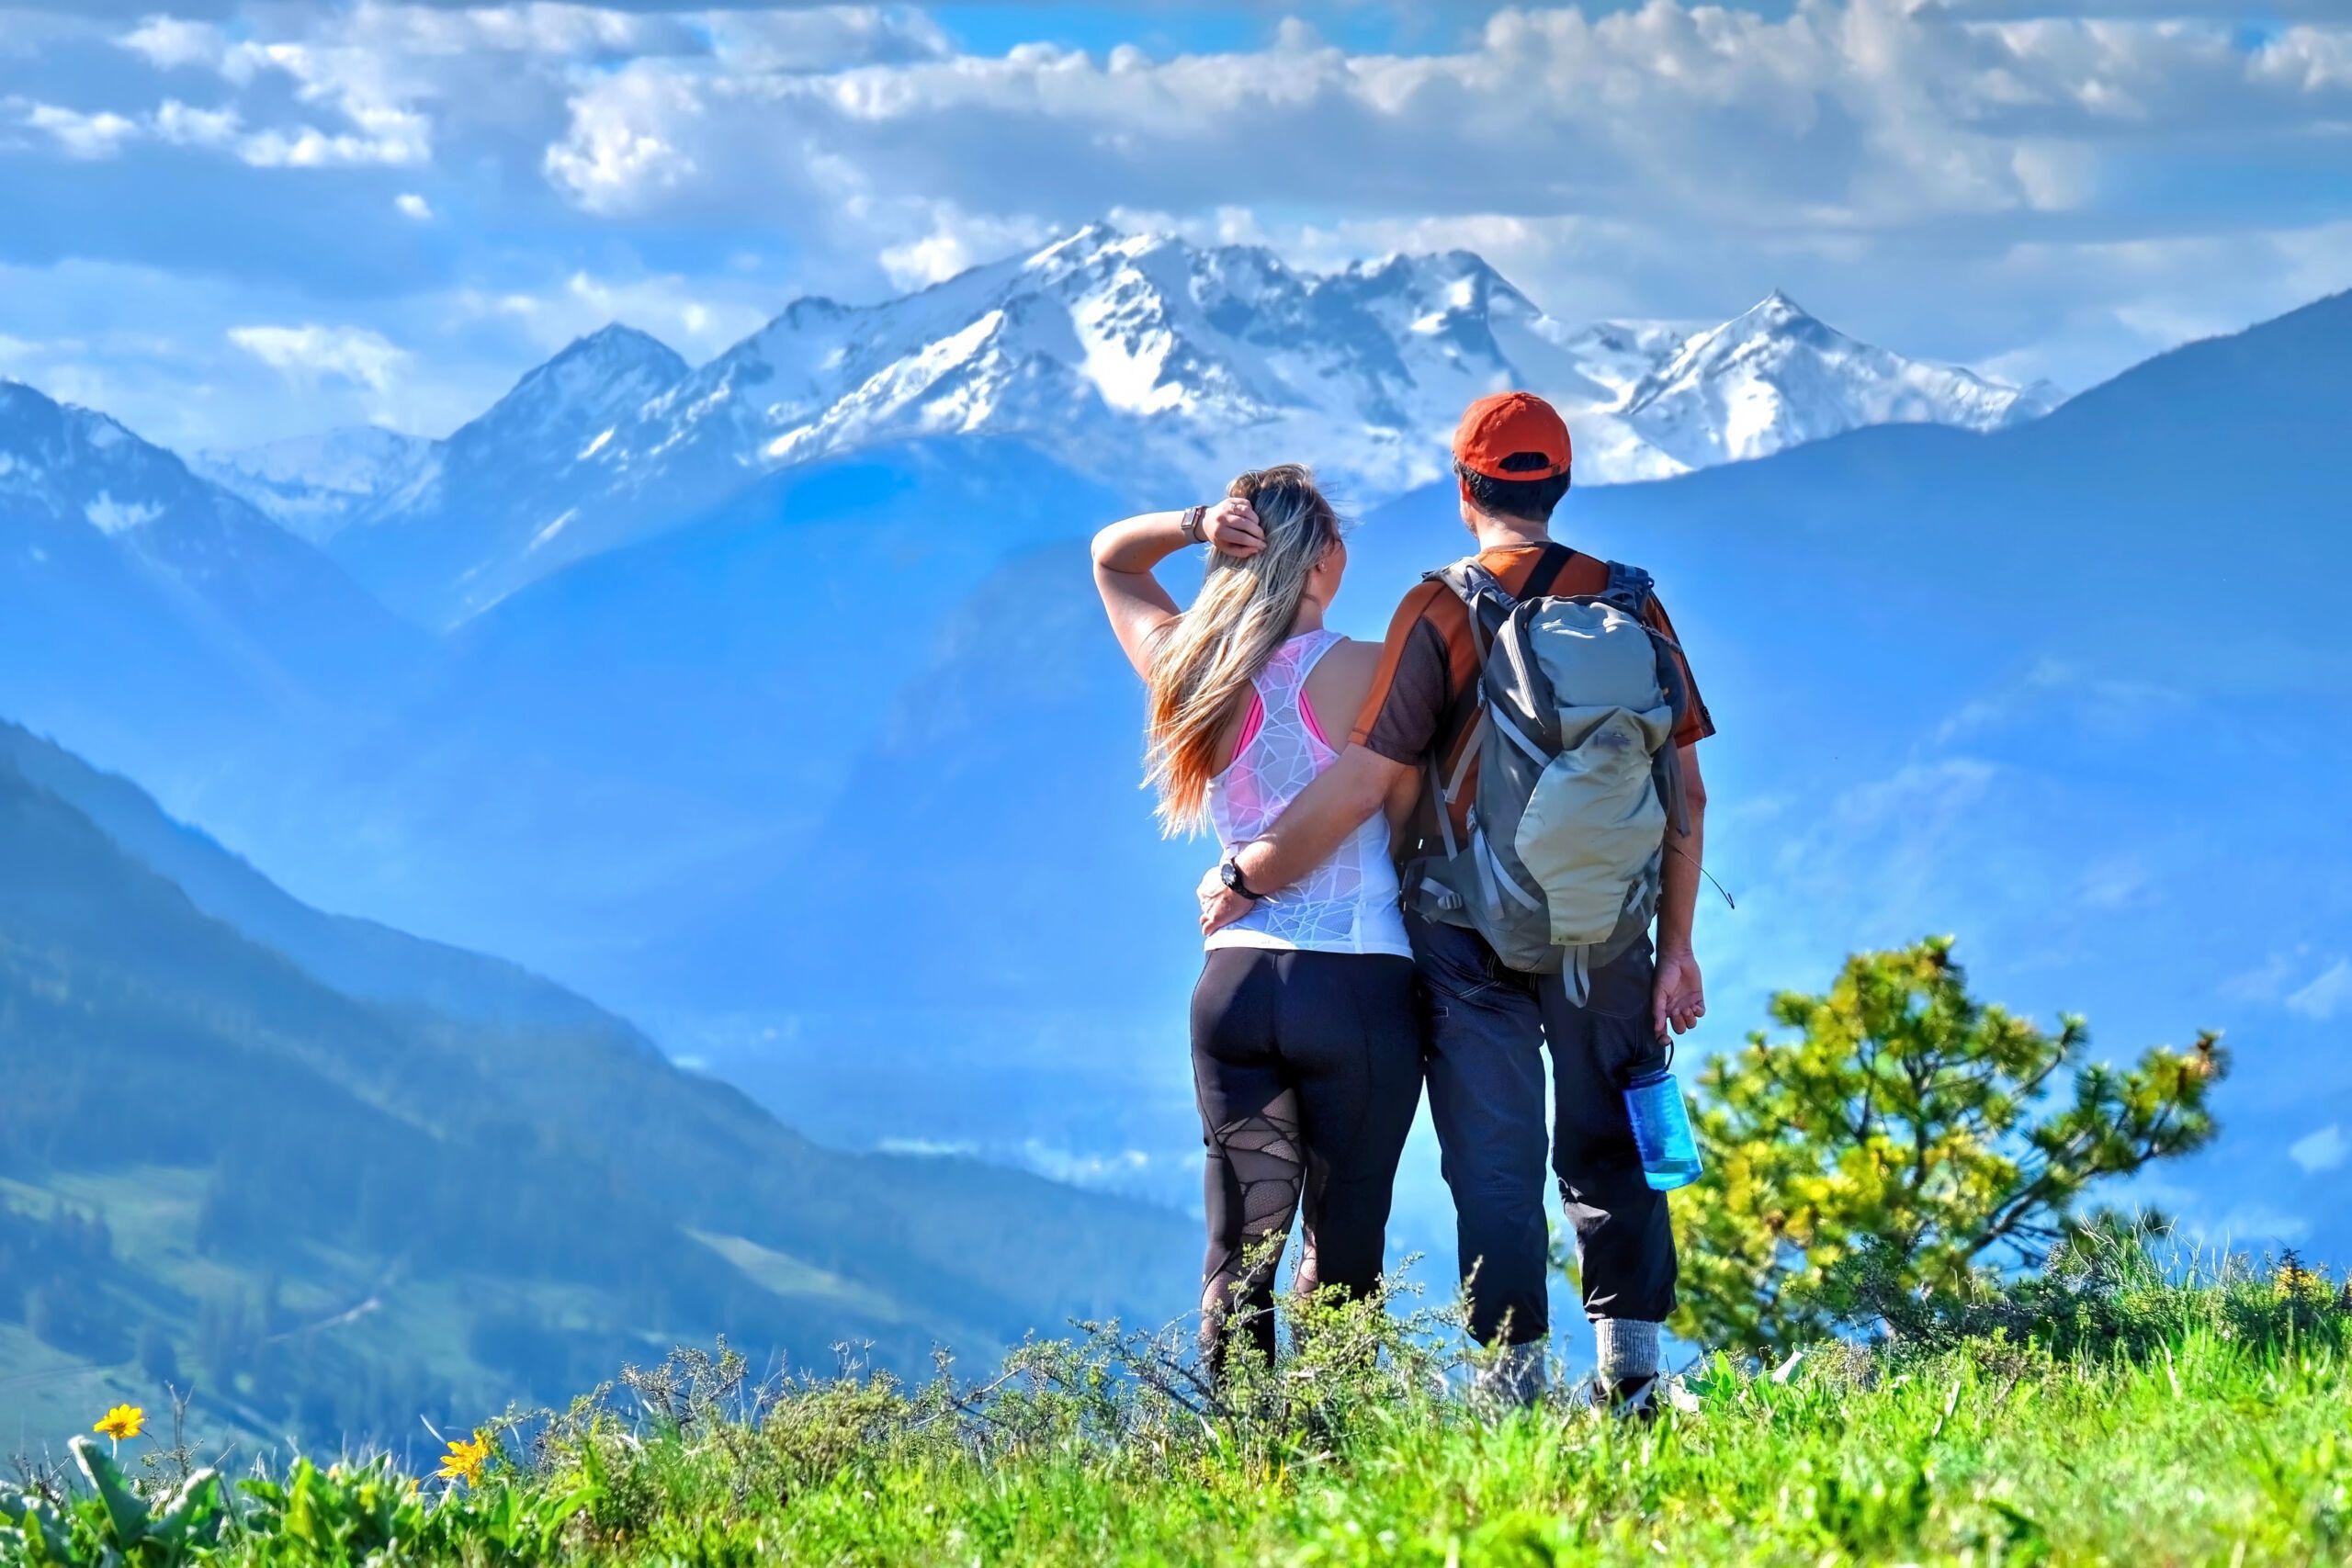 least-visited-national-parks-648237301